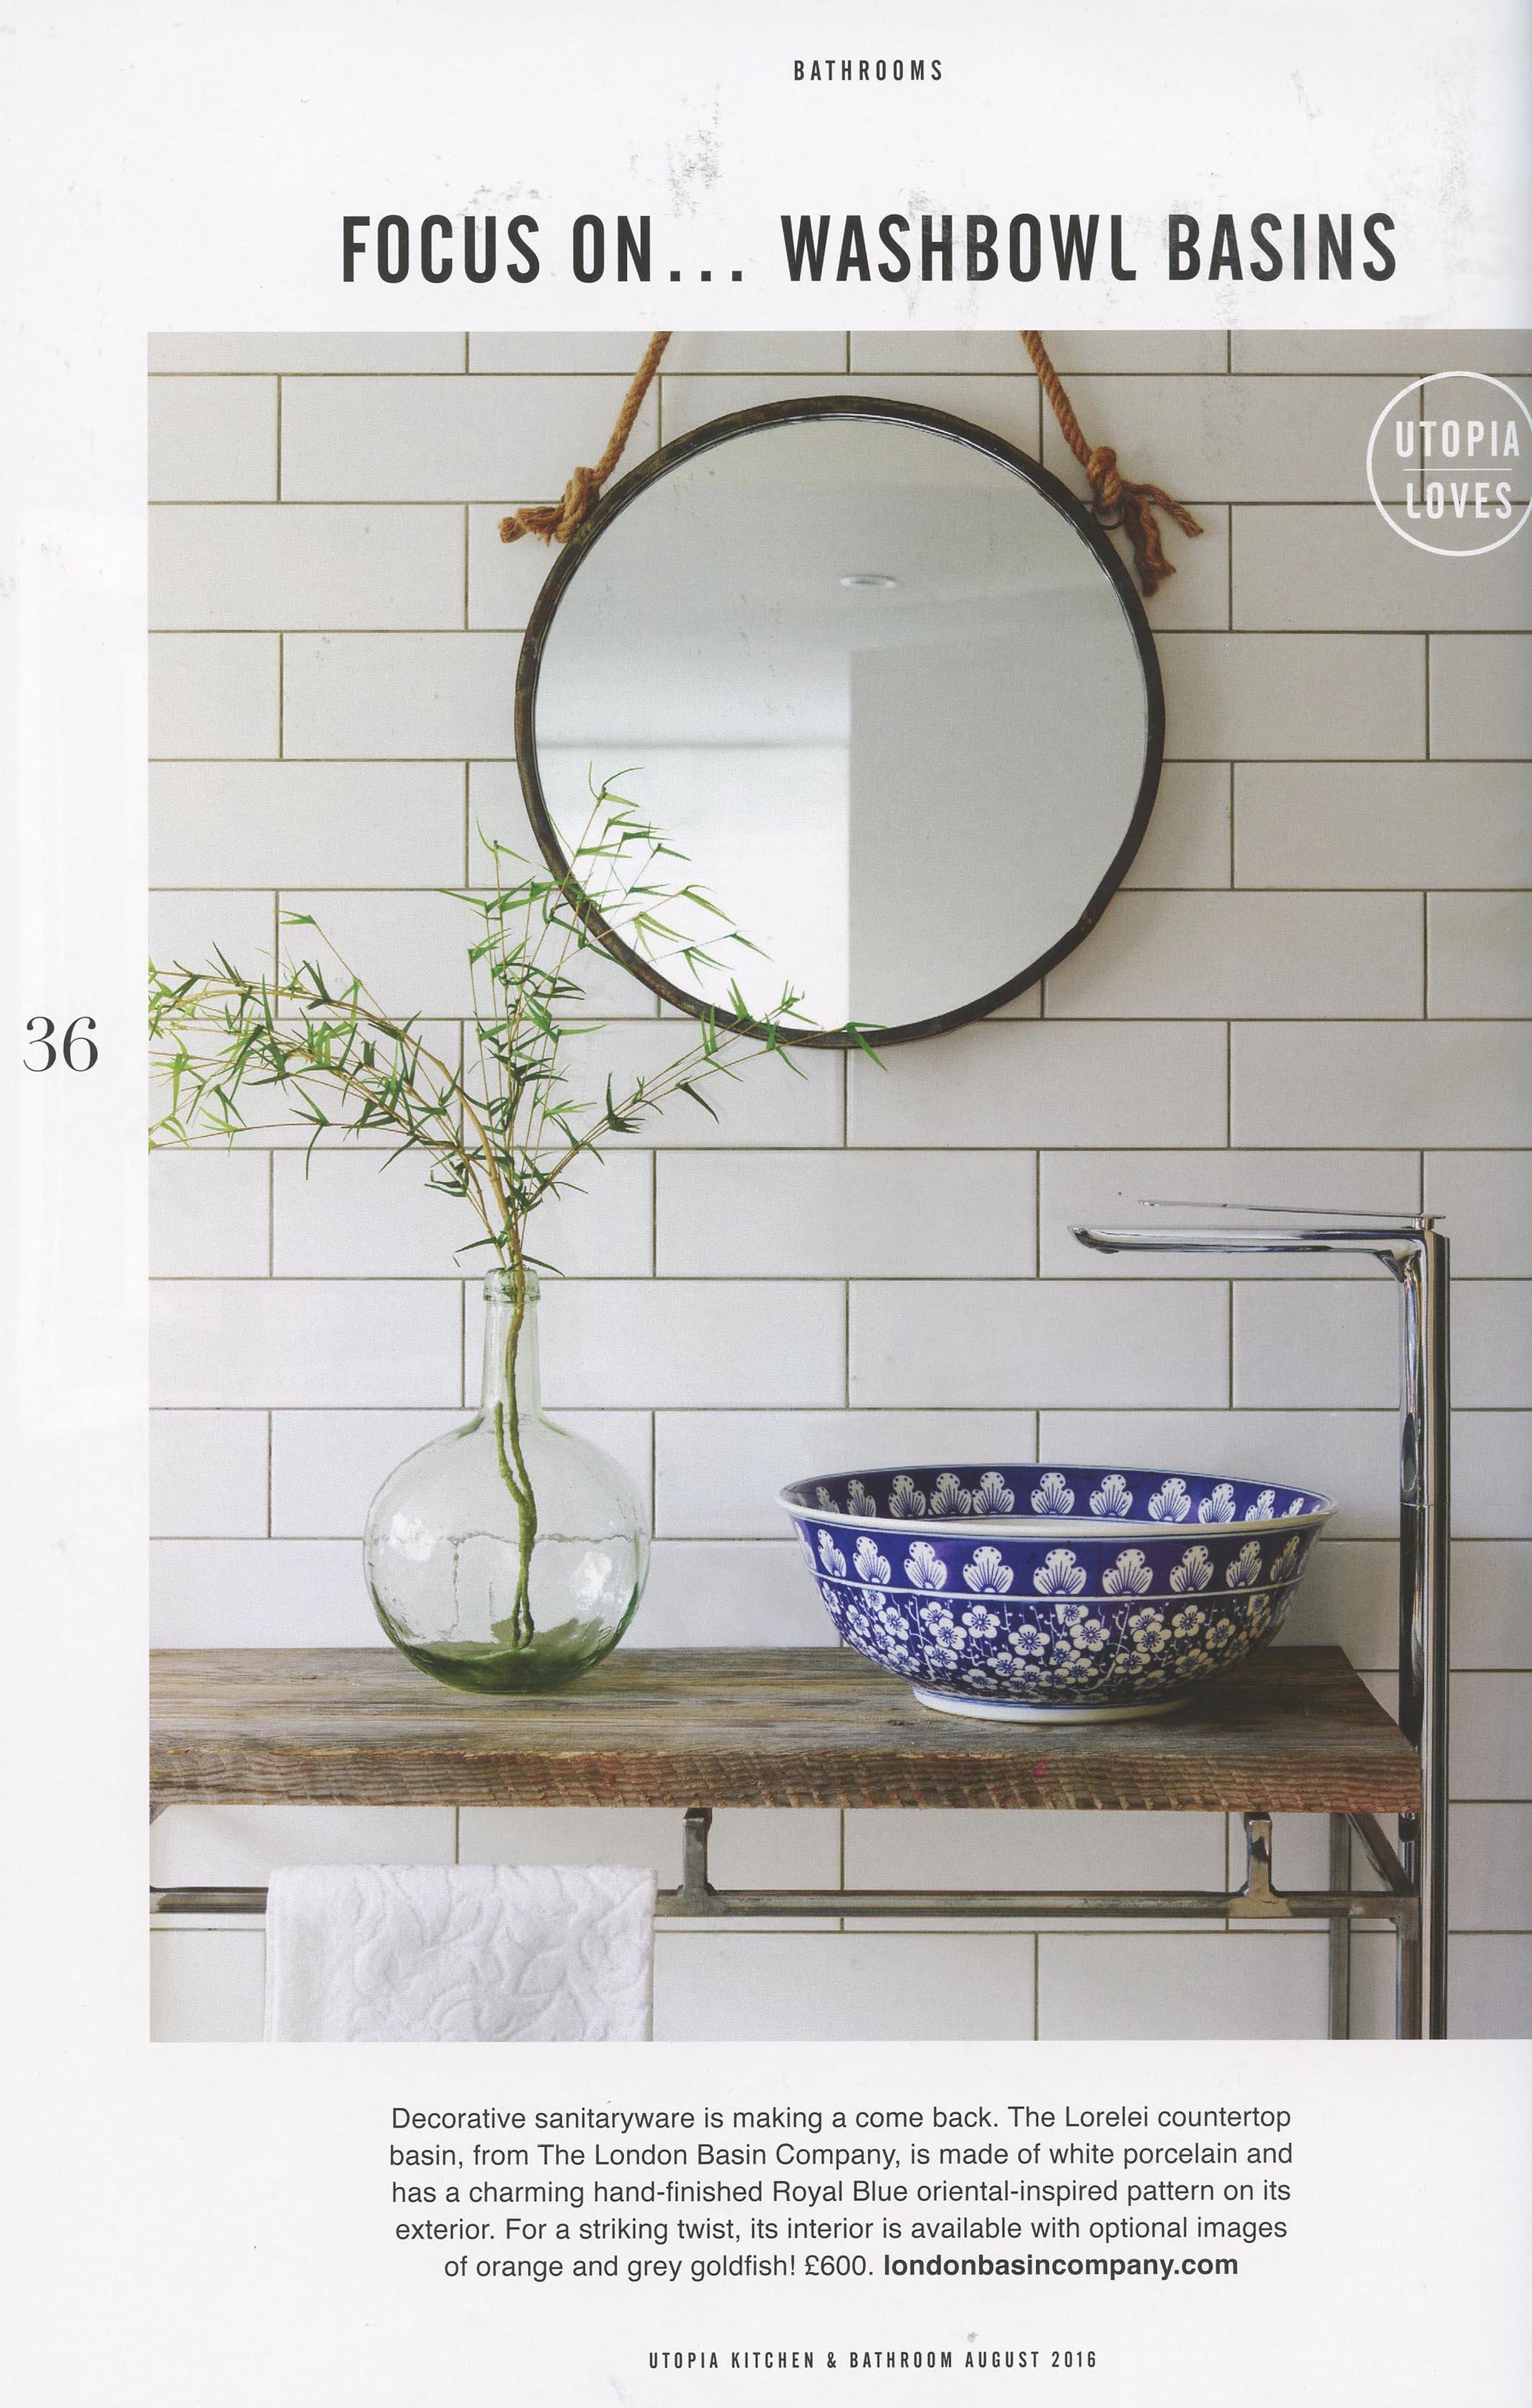 Utopia kitchen & bathroom August 2016 London Basin Company 2.jpg